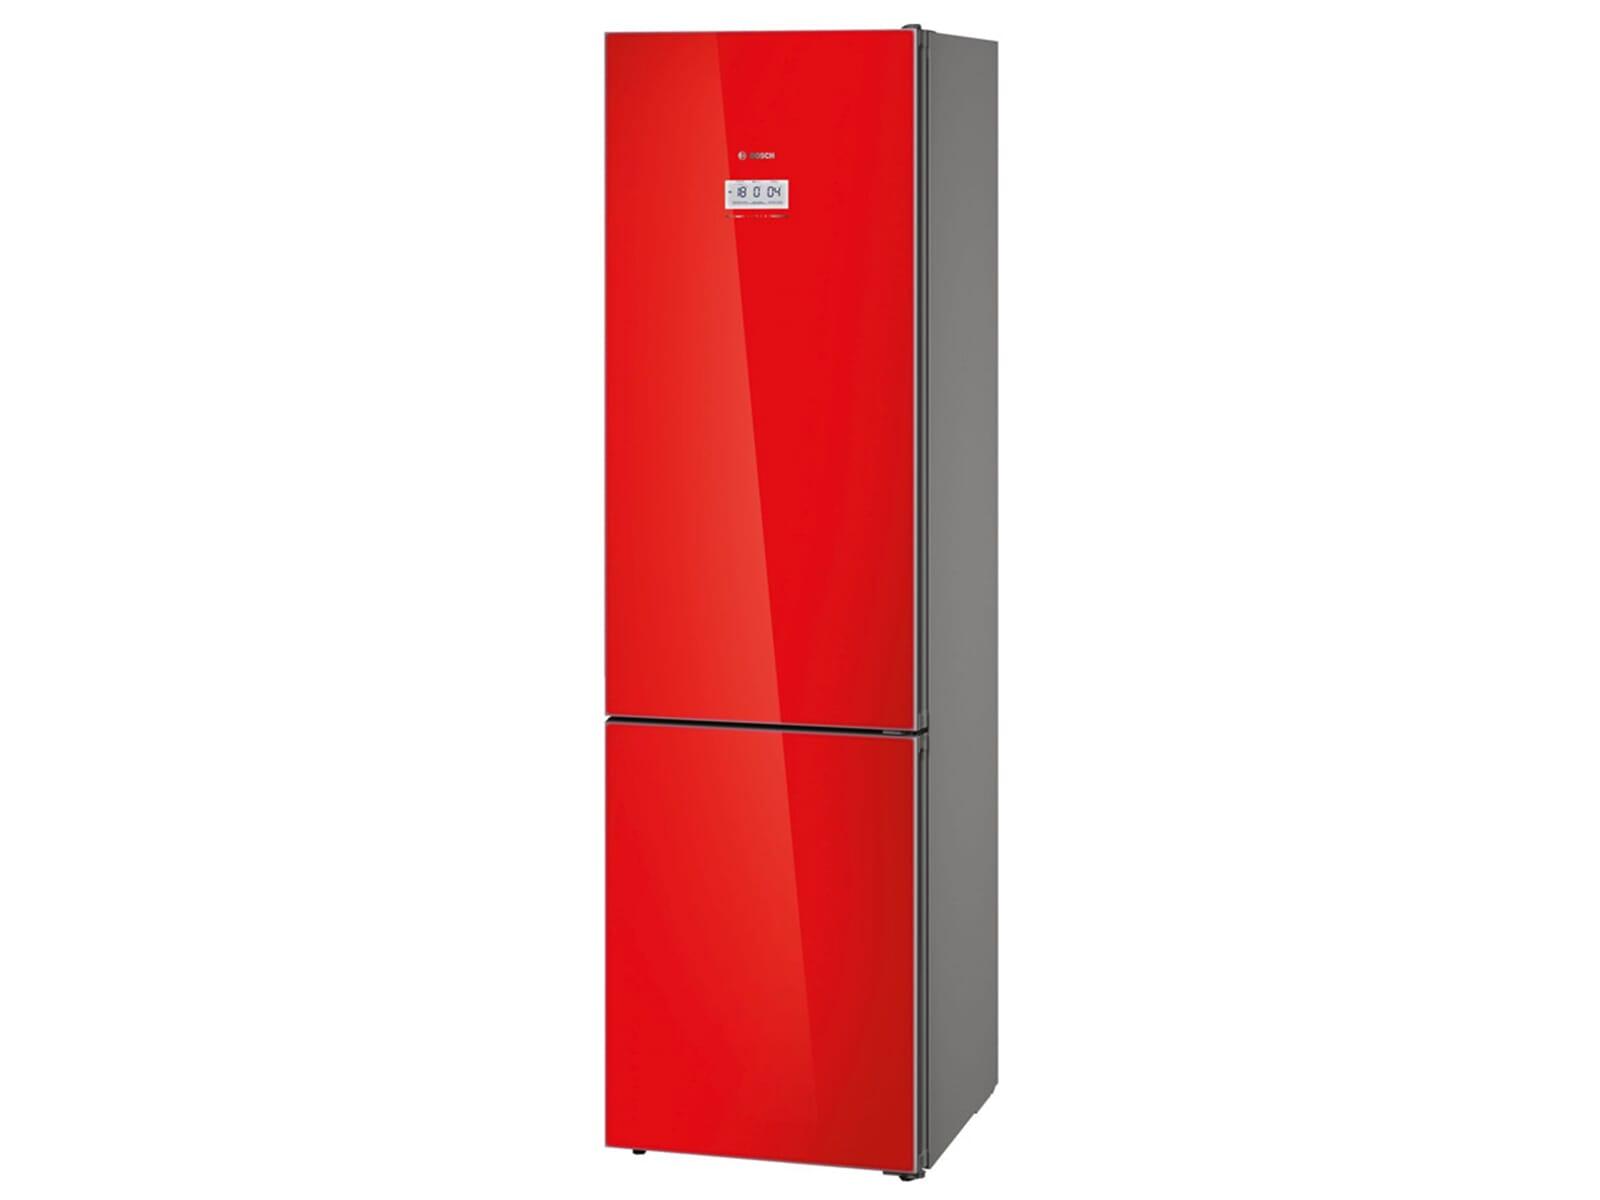 Bosch Kühlschrank No Frost : Bosch kgf sr kühl gefrierkombination rot